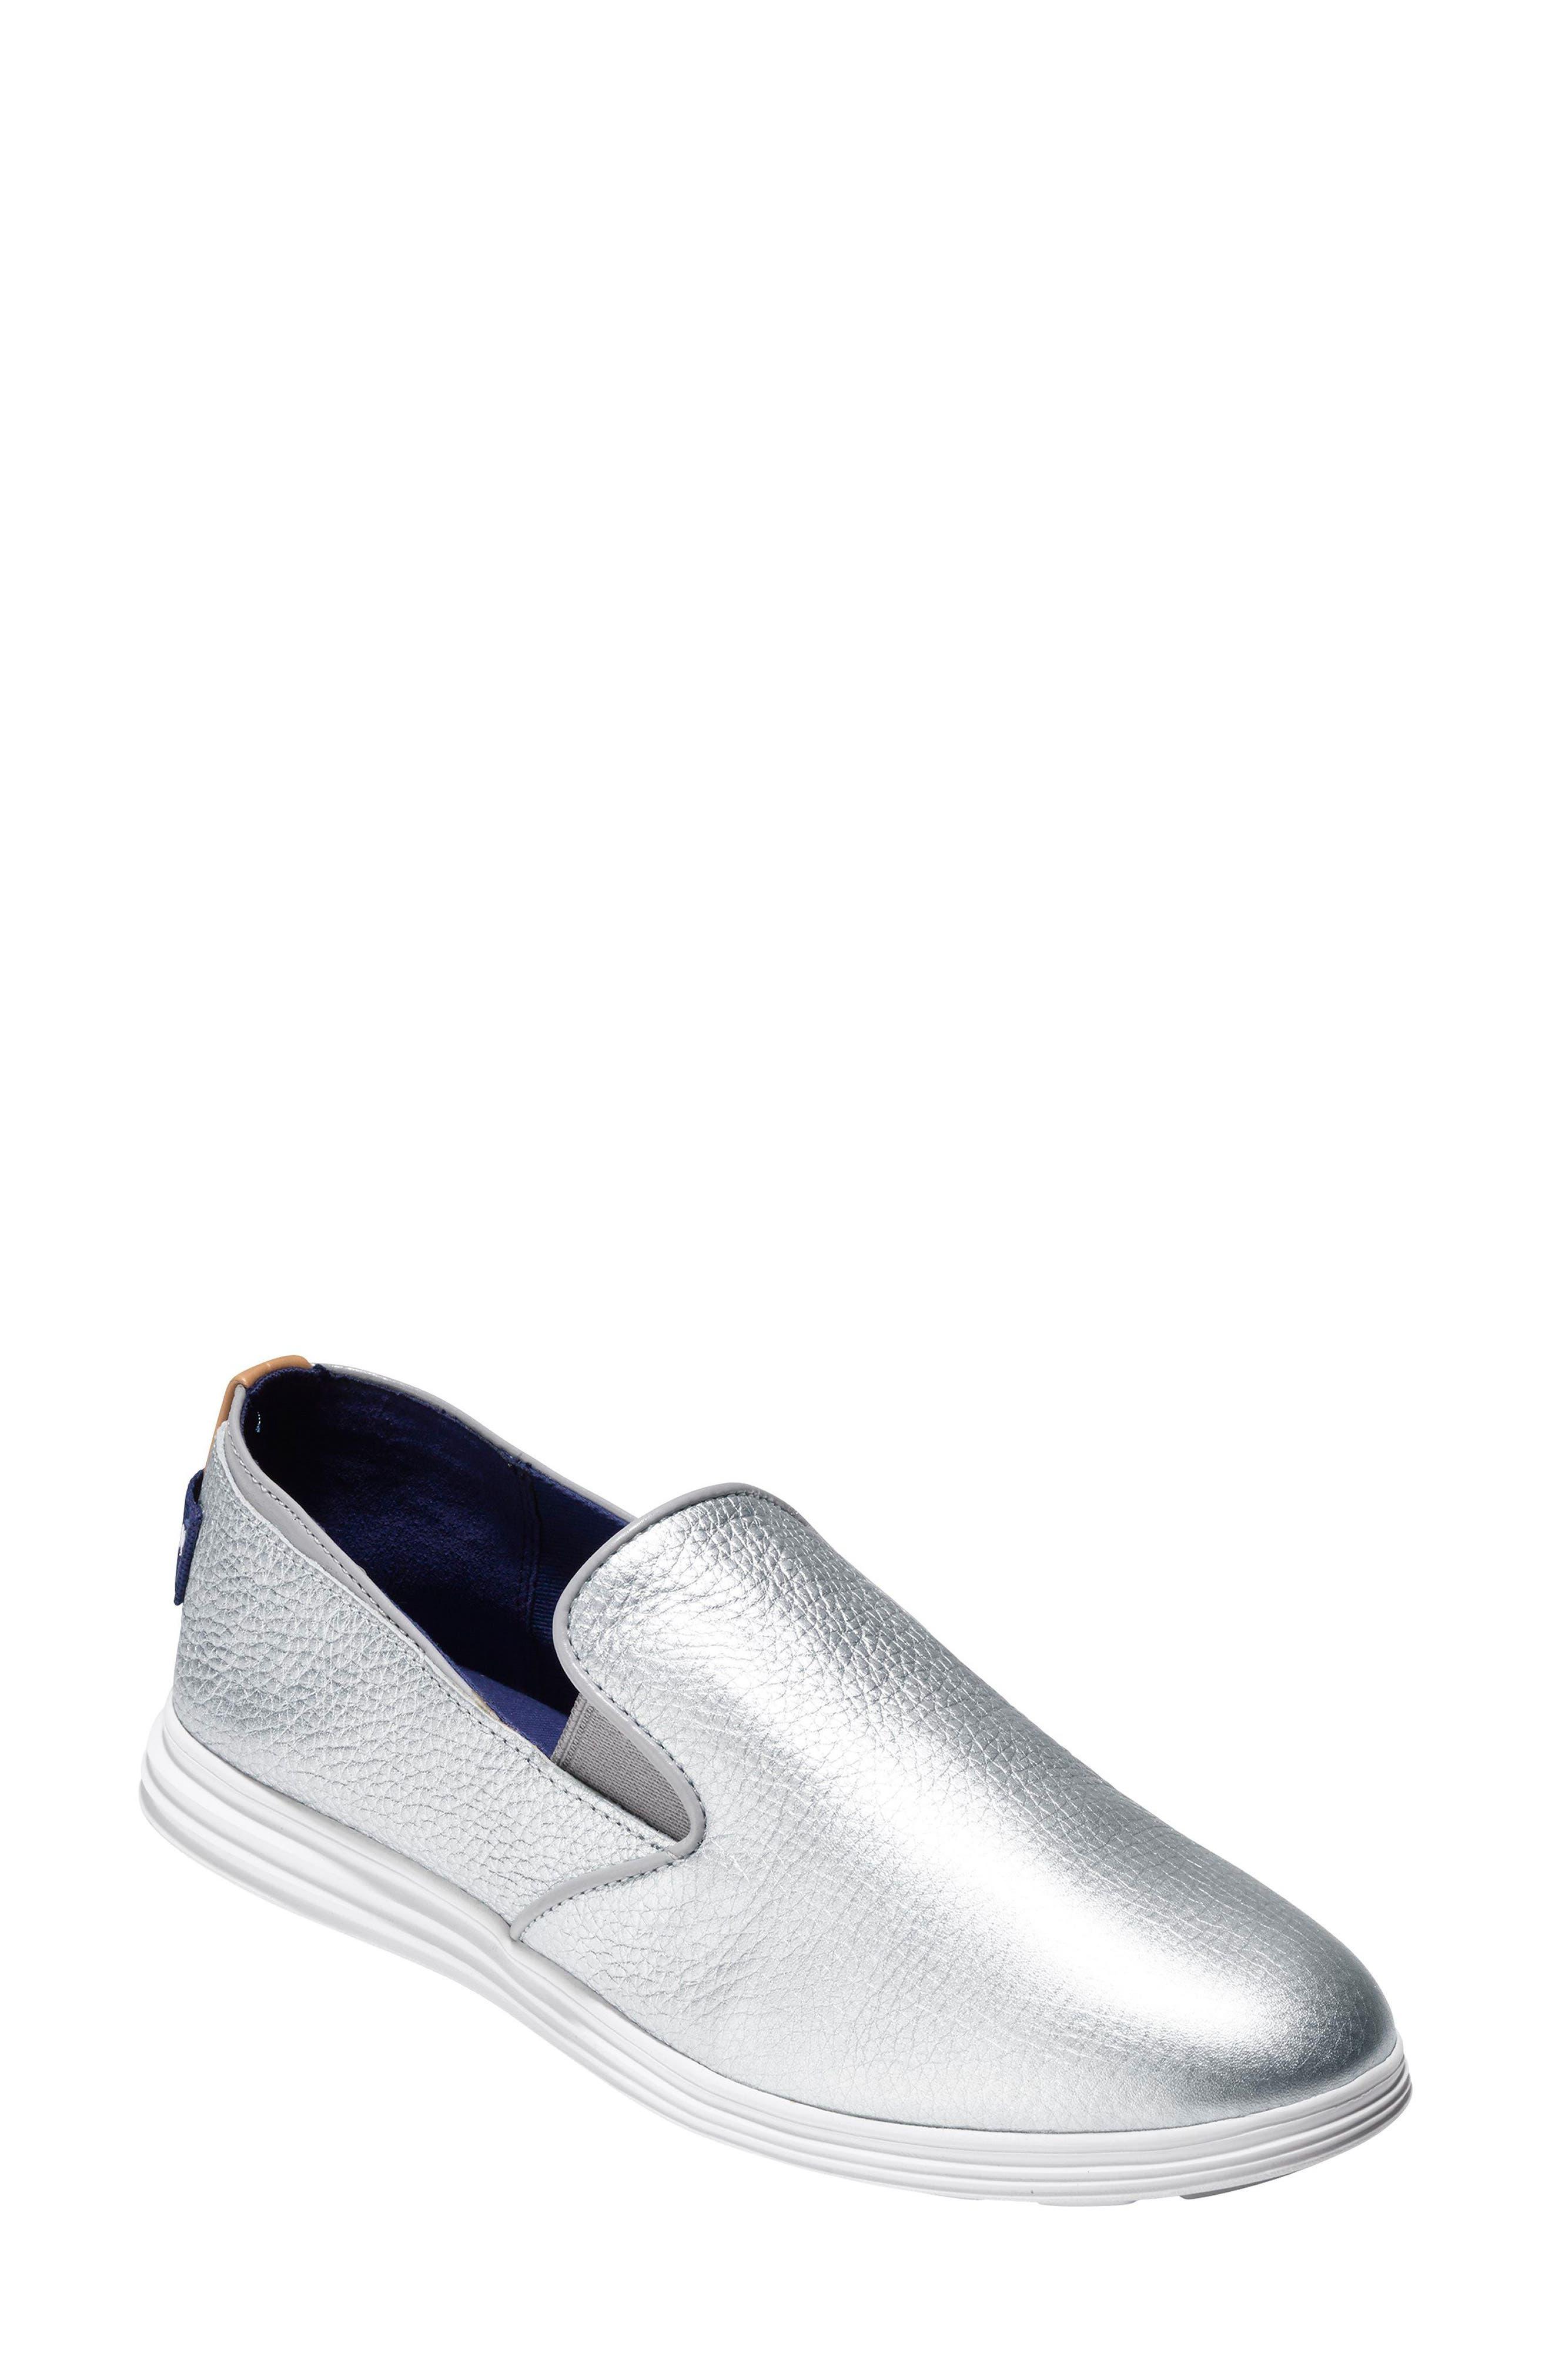 COLE HAAN 'Ella' Slip-On Sneaker